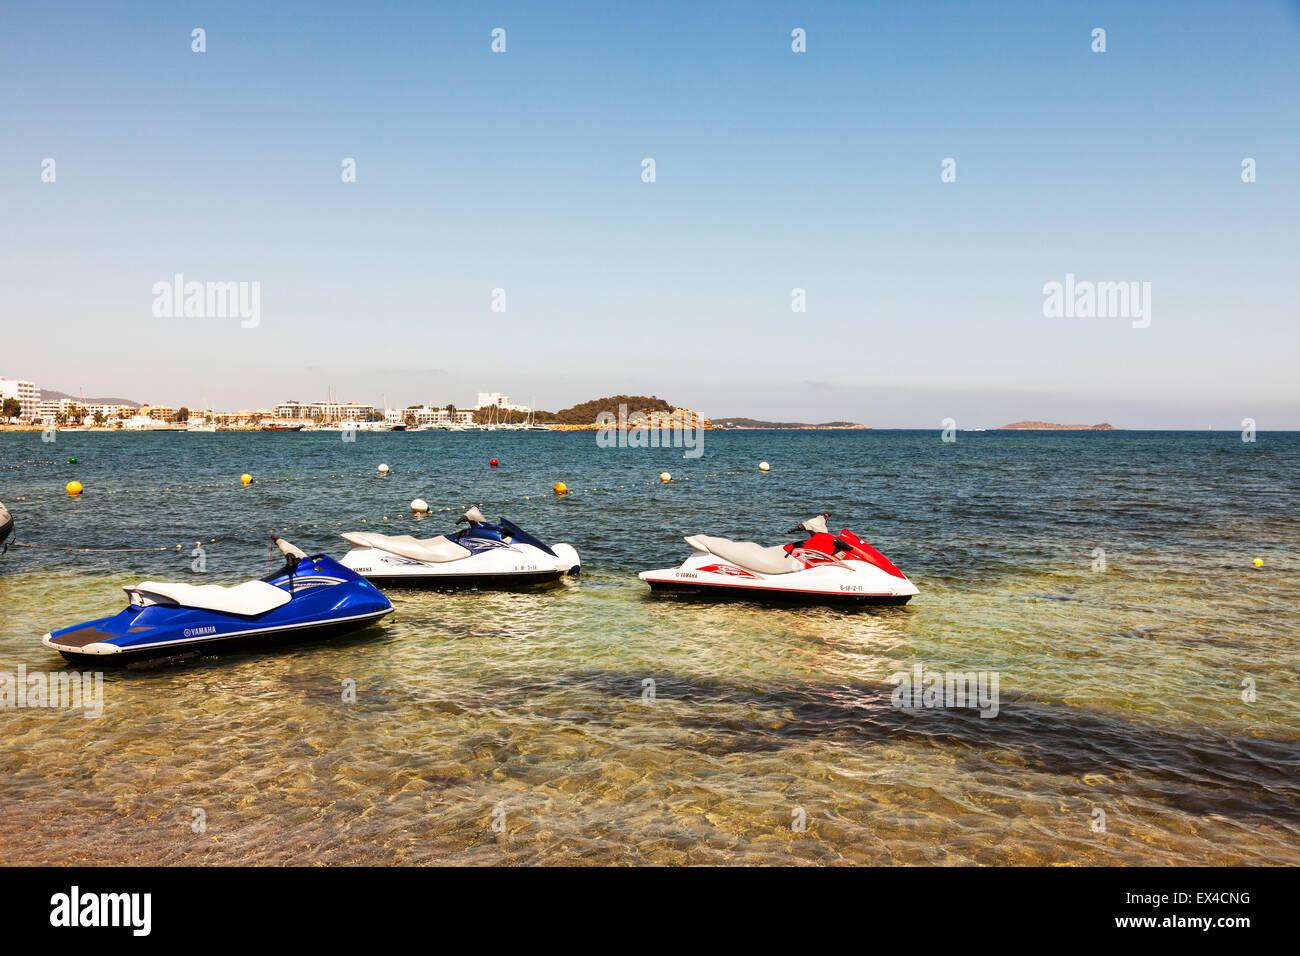 Jet ski machines jetski skies sea water sport sports watersport watersports - Stock Image